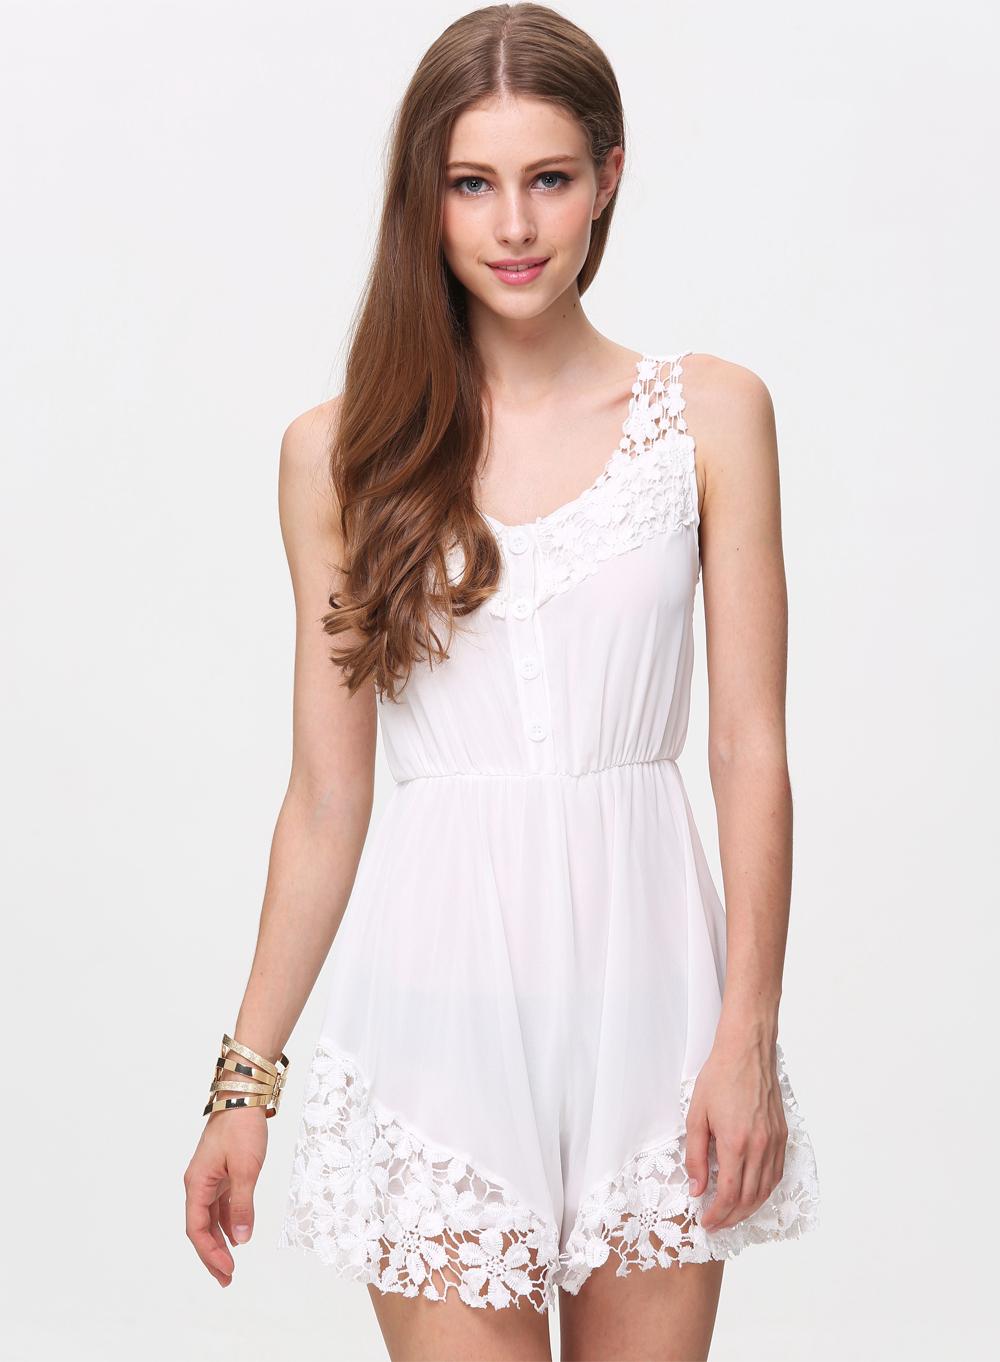 White Sleeveless Floral Crochet Lace Jumpsuit - Sheinside.com